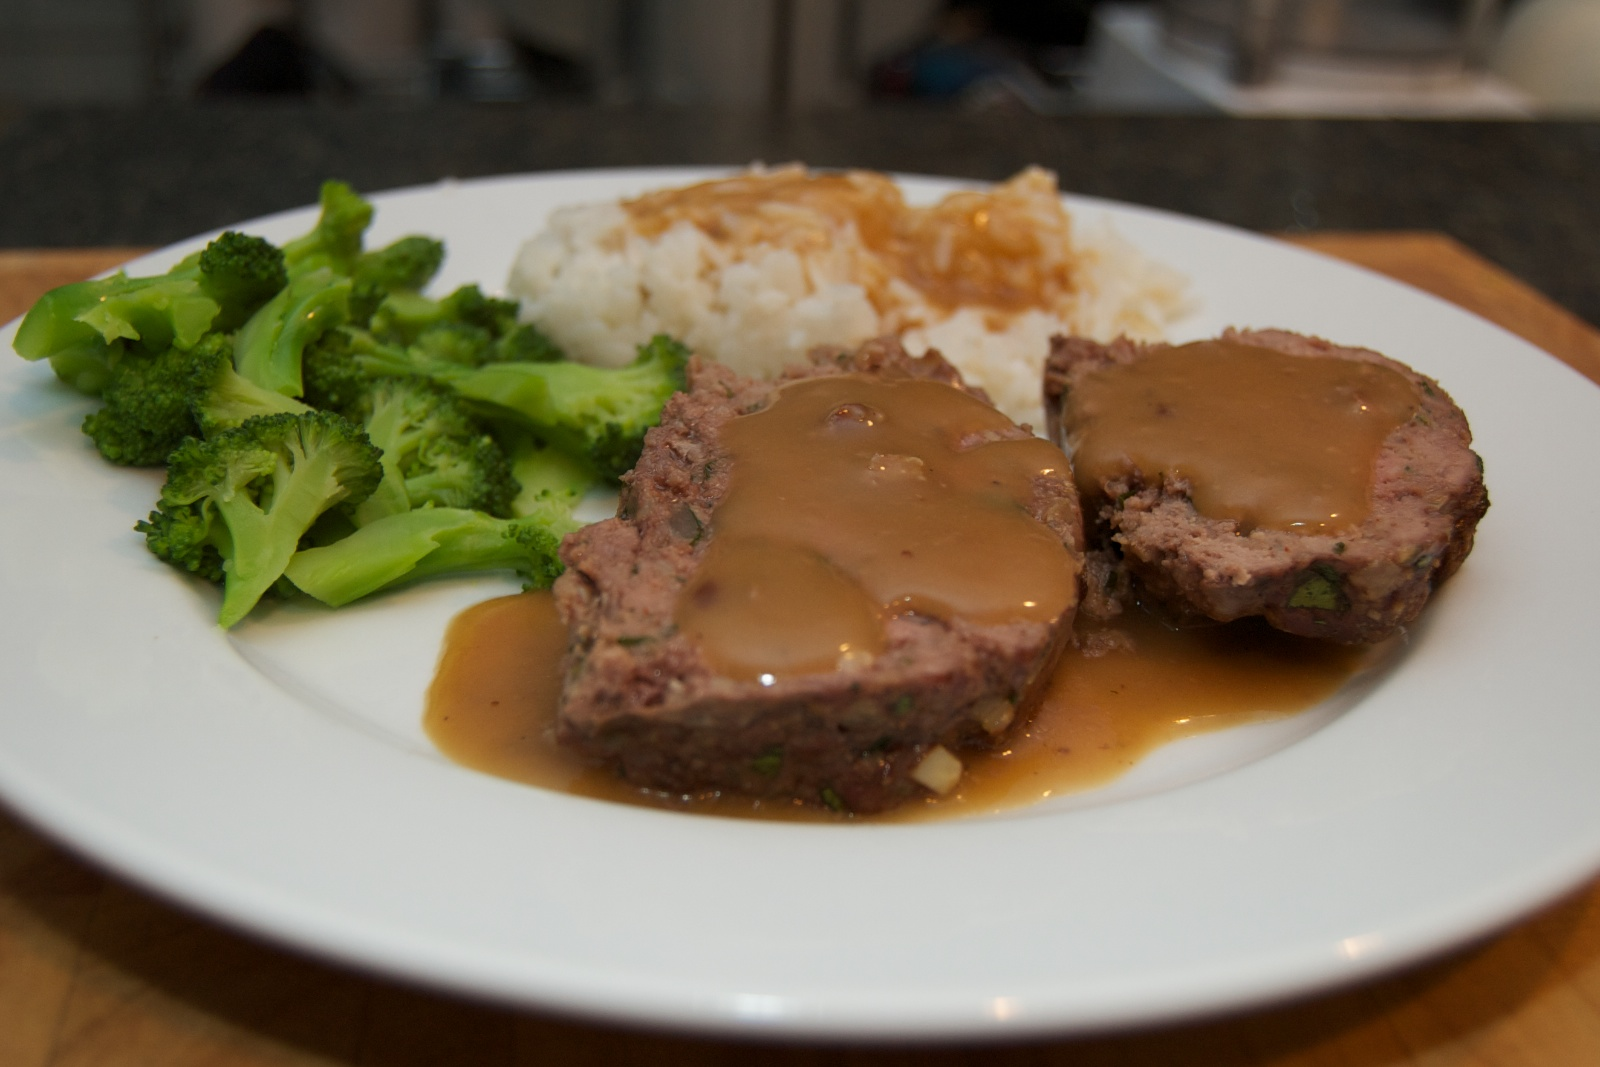 http://blog.rickk.com/food/2010/12/22/ate.20101222.d.jpg